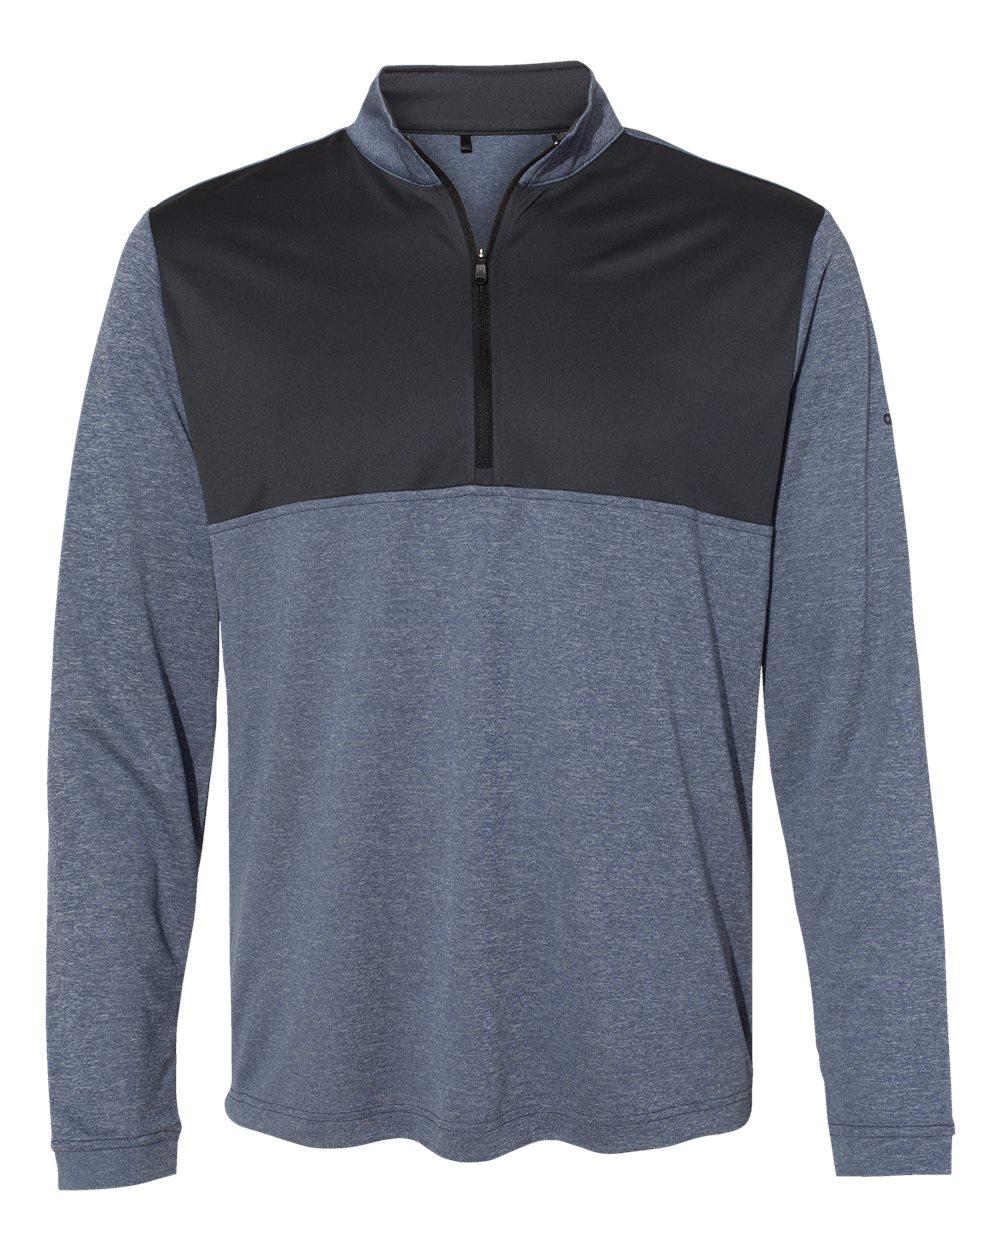 Adidas-Mens-Lightweight-UPF-pullover-Shirt-Warmup-A280-up-to-4XL thumbnail 9